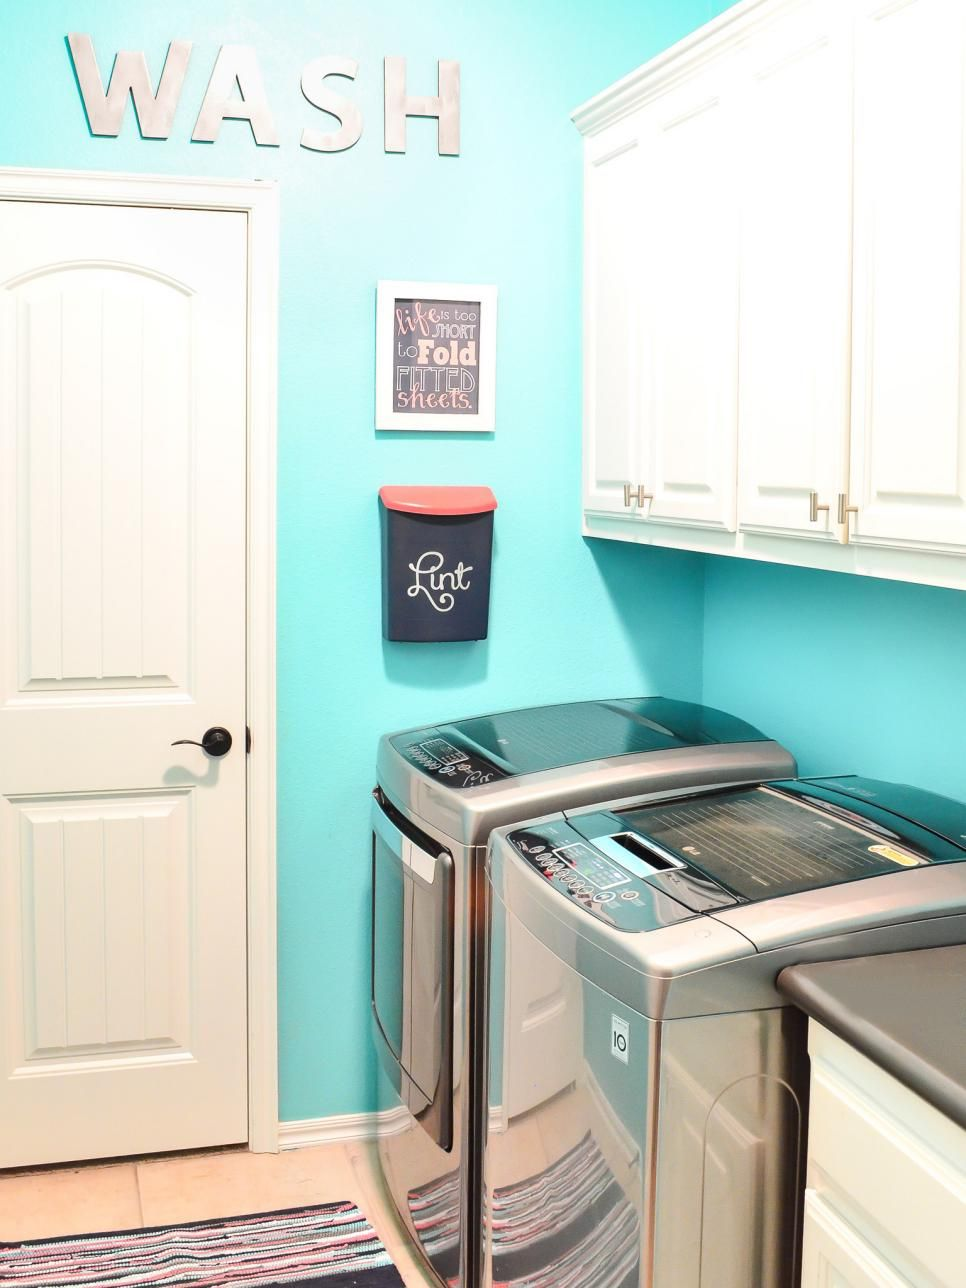 A Trashcan Takes Up Precious Floor Space So Blogger Melissa